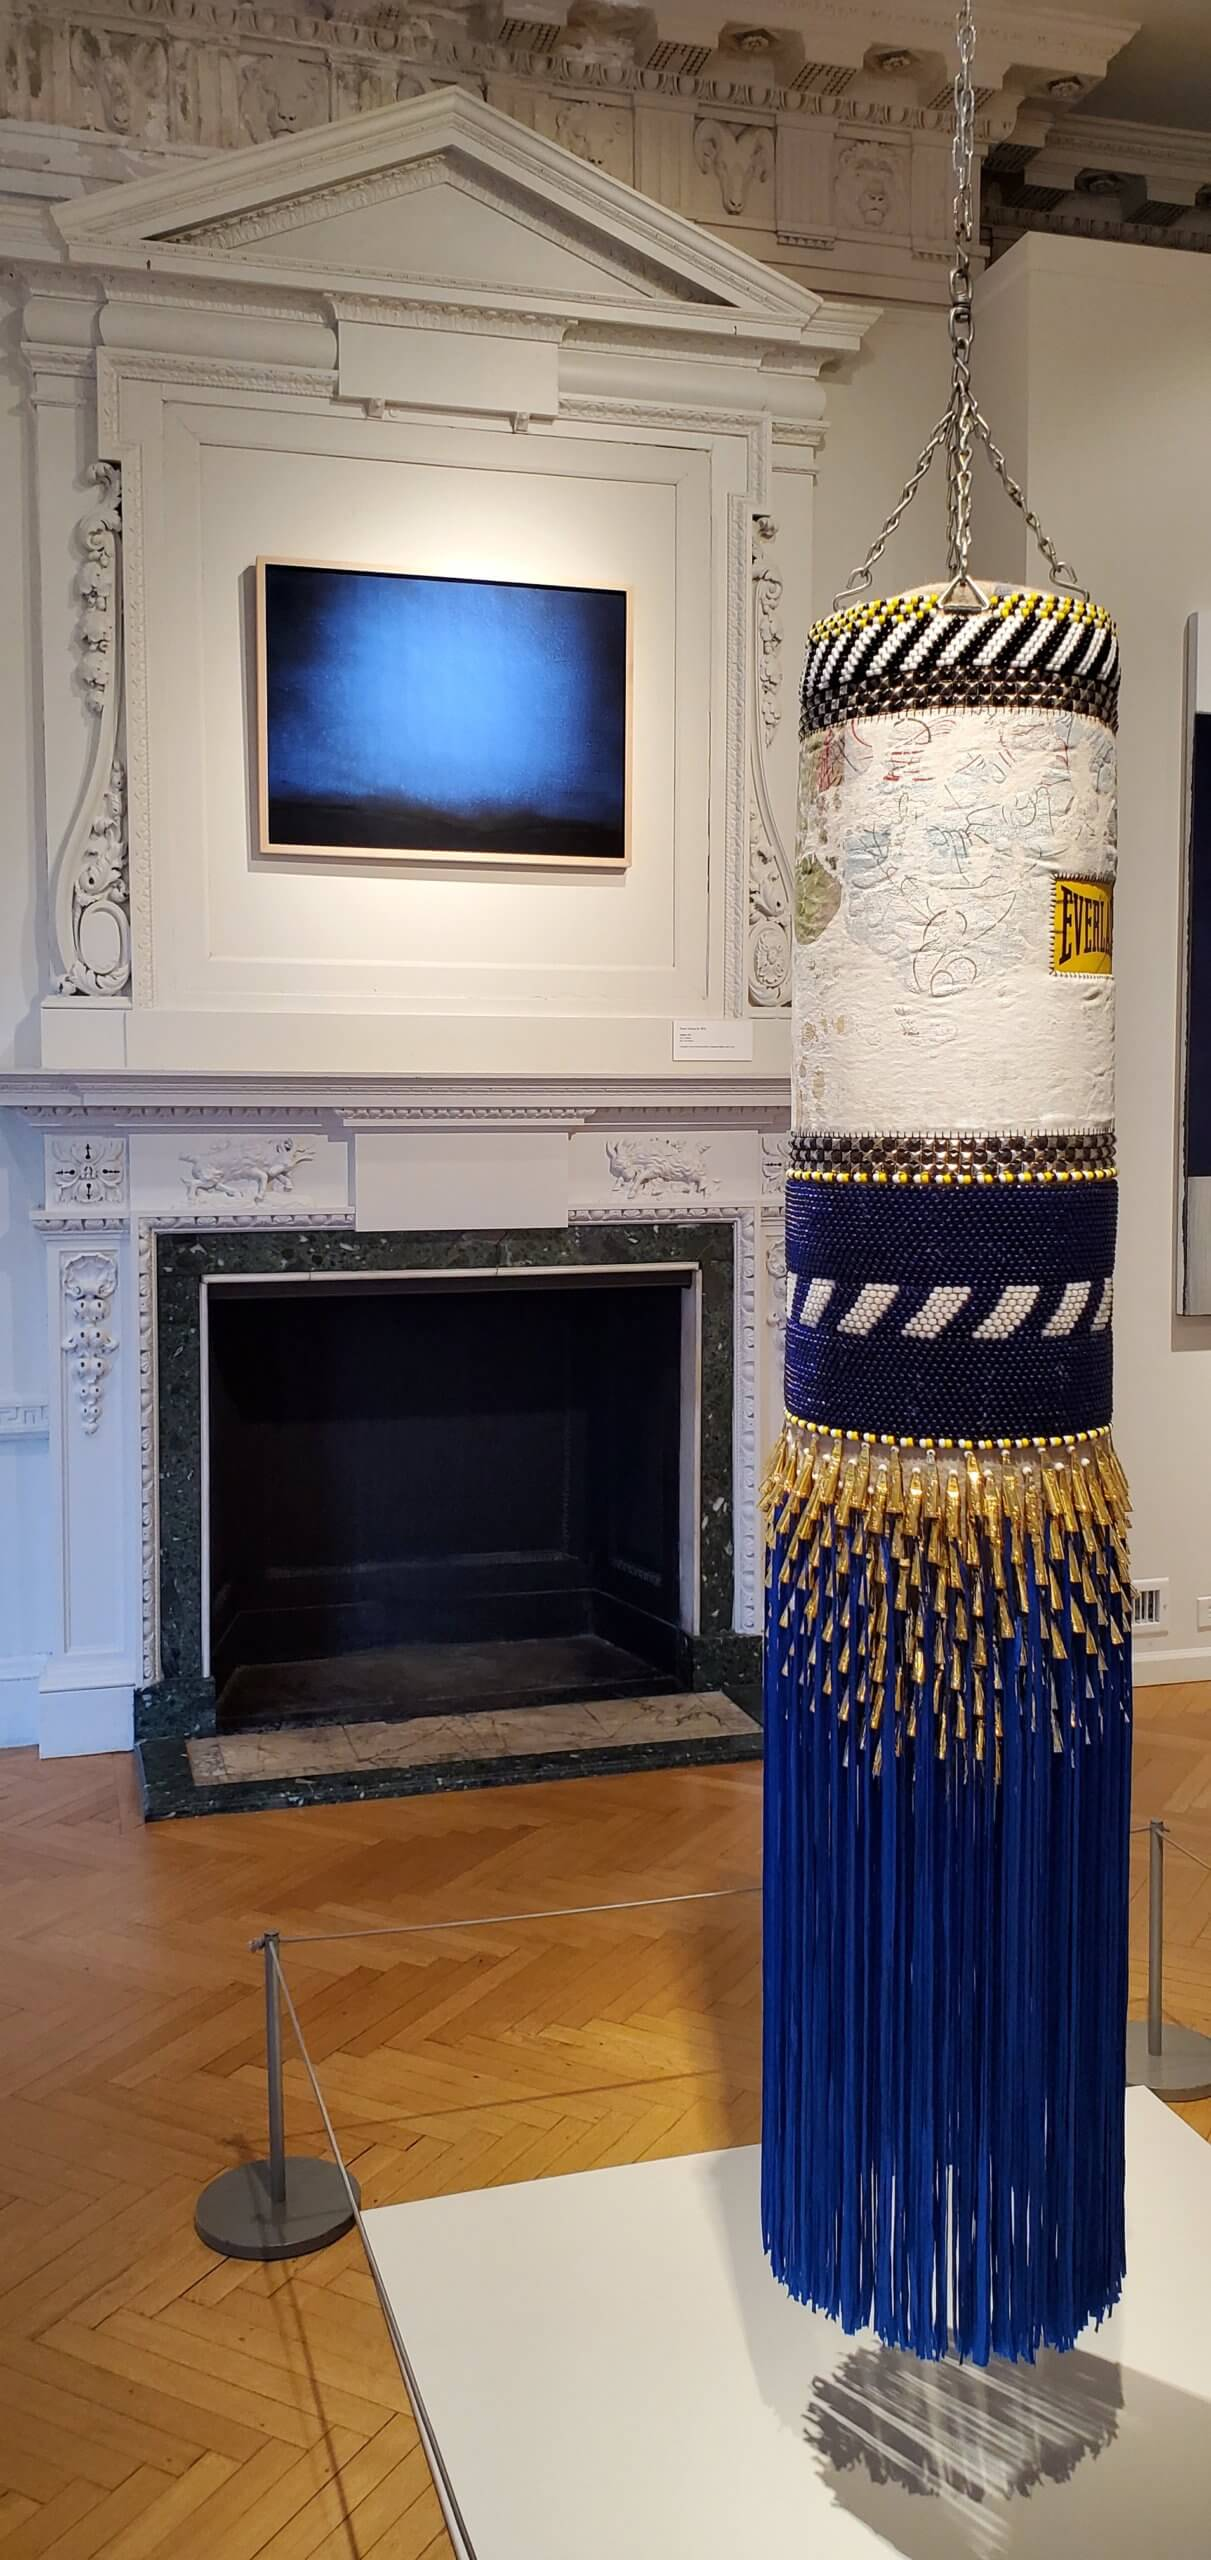 Jeffery Gibson – DEEP BLUE DAY, 2014 | Nassau County Museum of Art